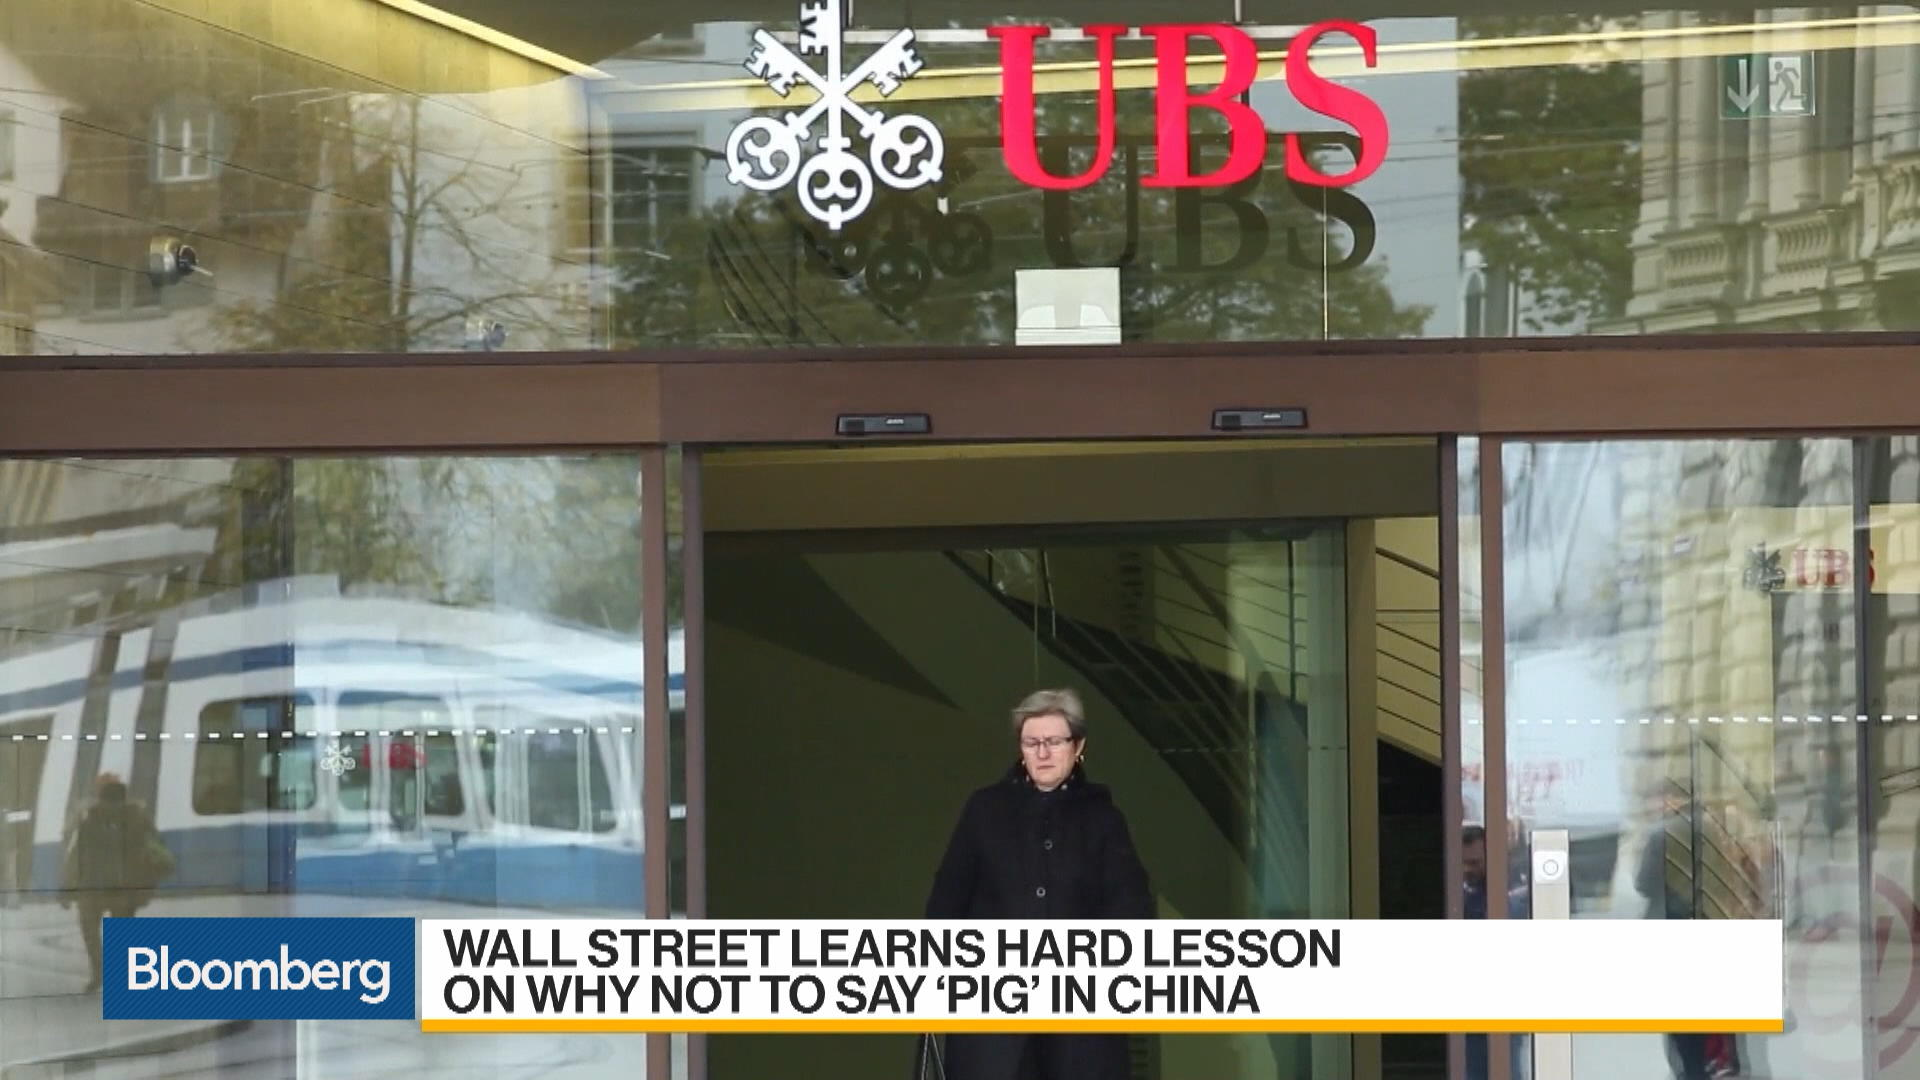 UBS Loses China Bond Deal After Economist's Pig Remark